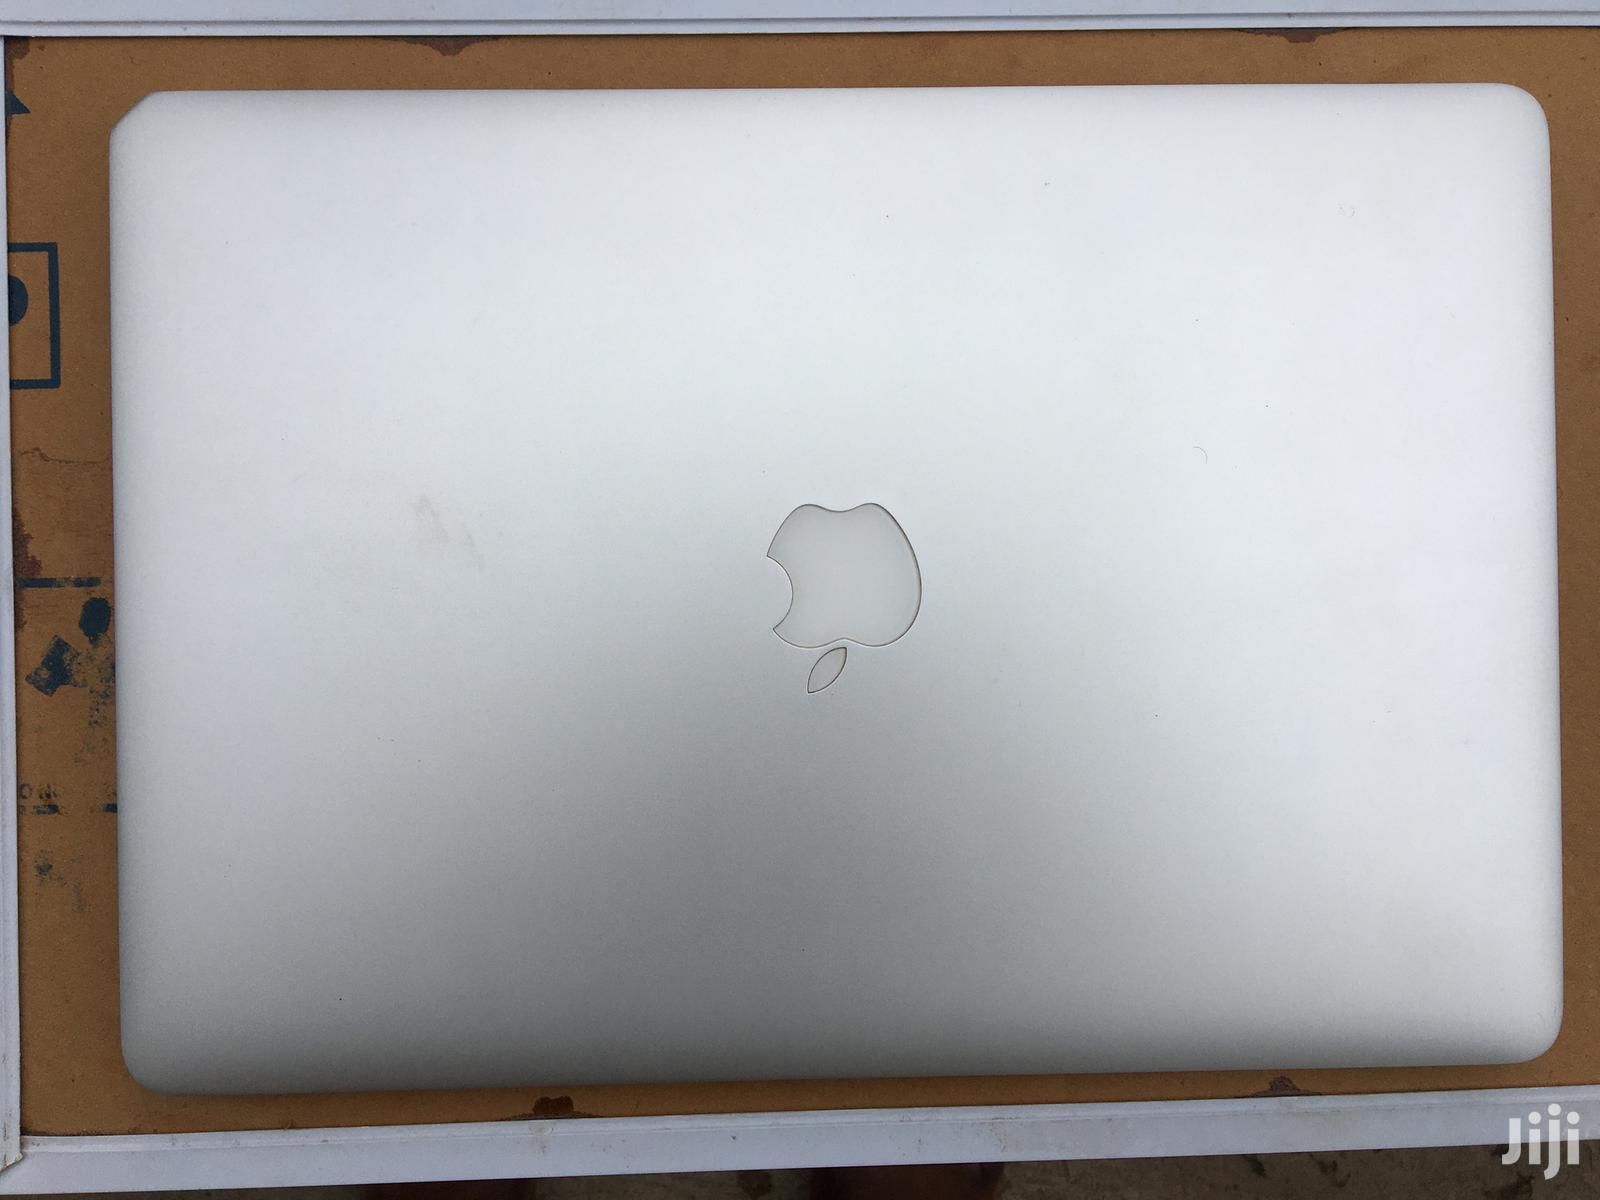 Laptop Apple MacBook Pro 16GB Intel Core i7 SSD 256GB | Laptops & Computers for sale in Accra Metropolitan, Greater Accra, Ghana